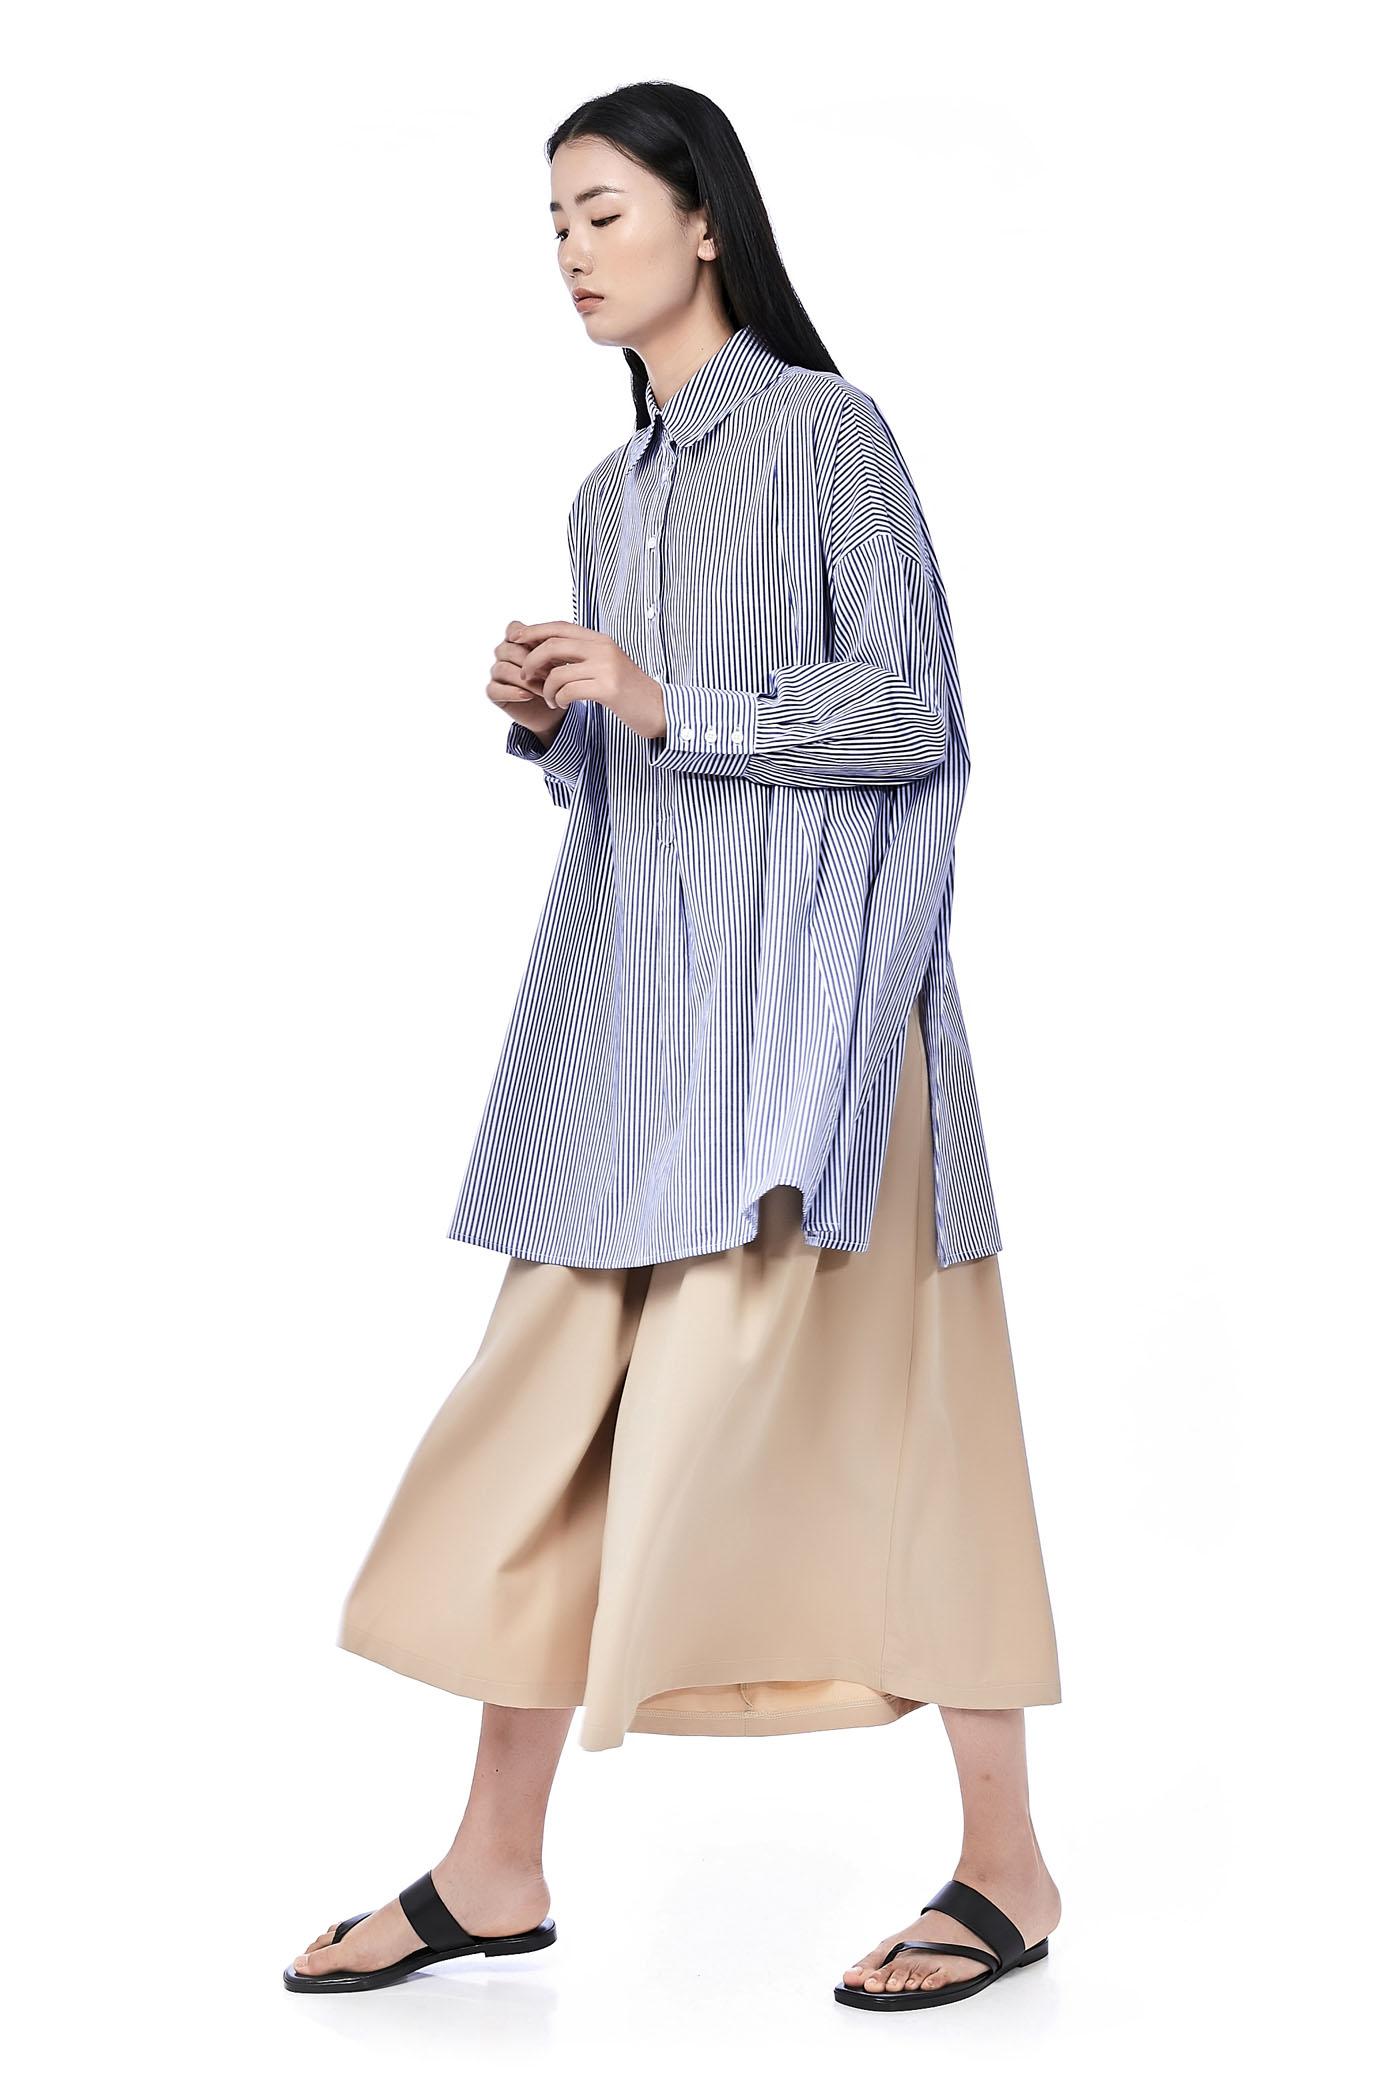 Pautrine Shirtdress